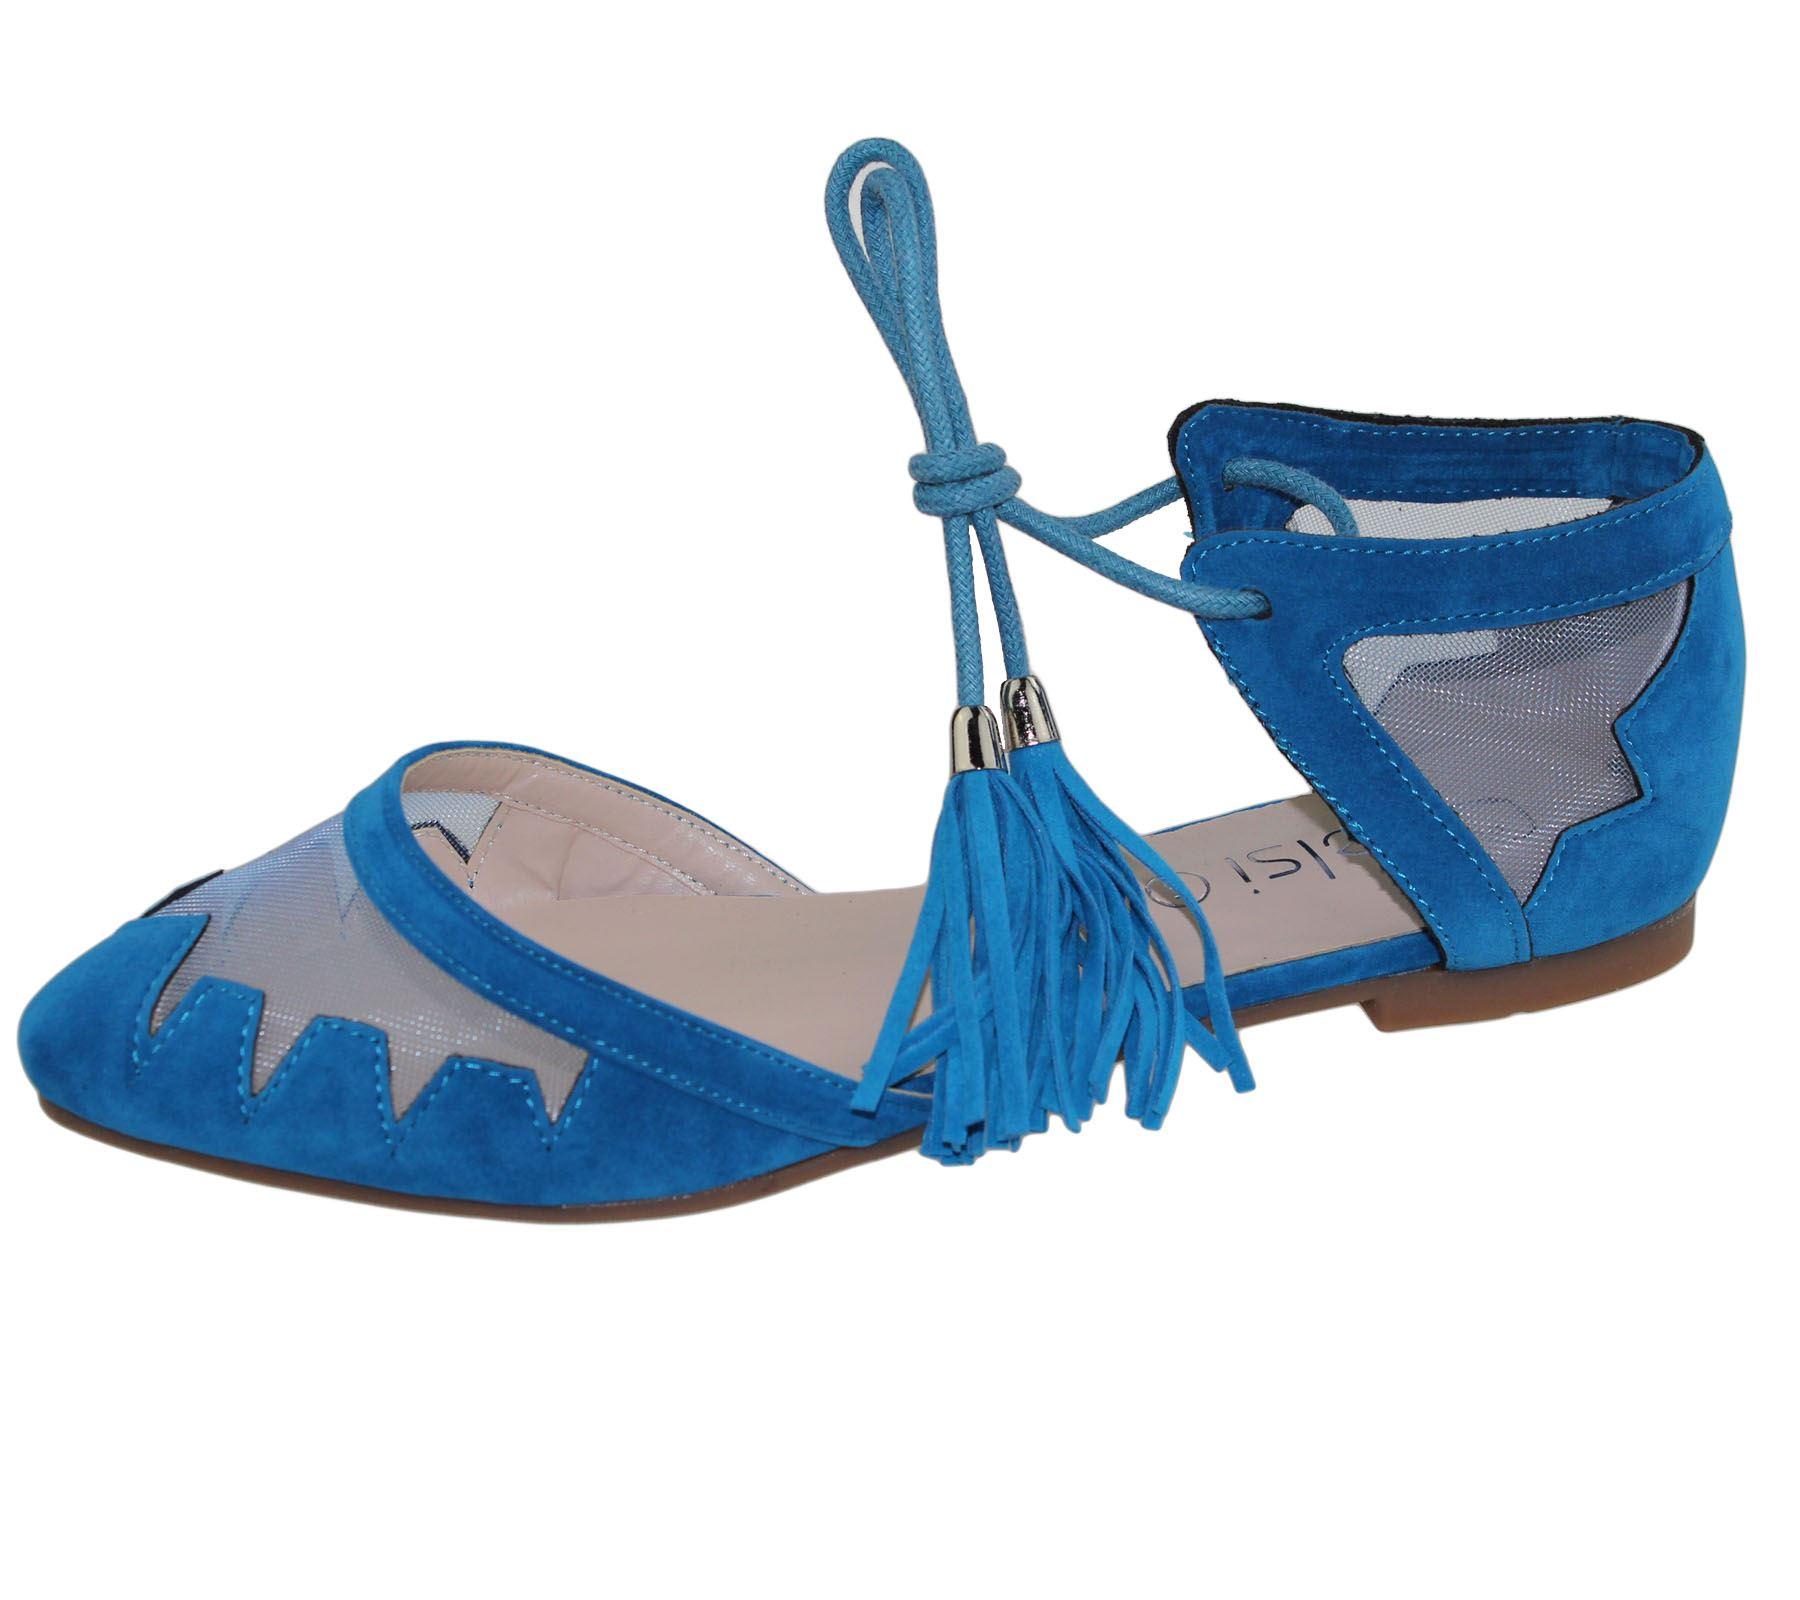 Womens-Flat-Ballerina-Dolly-Pumps-Ballet-Ladies-Summer-Mesh-Tassel-Shoes-Sandals thumbnail 4